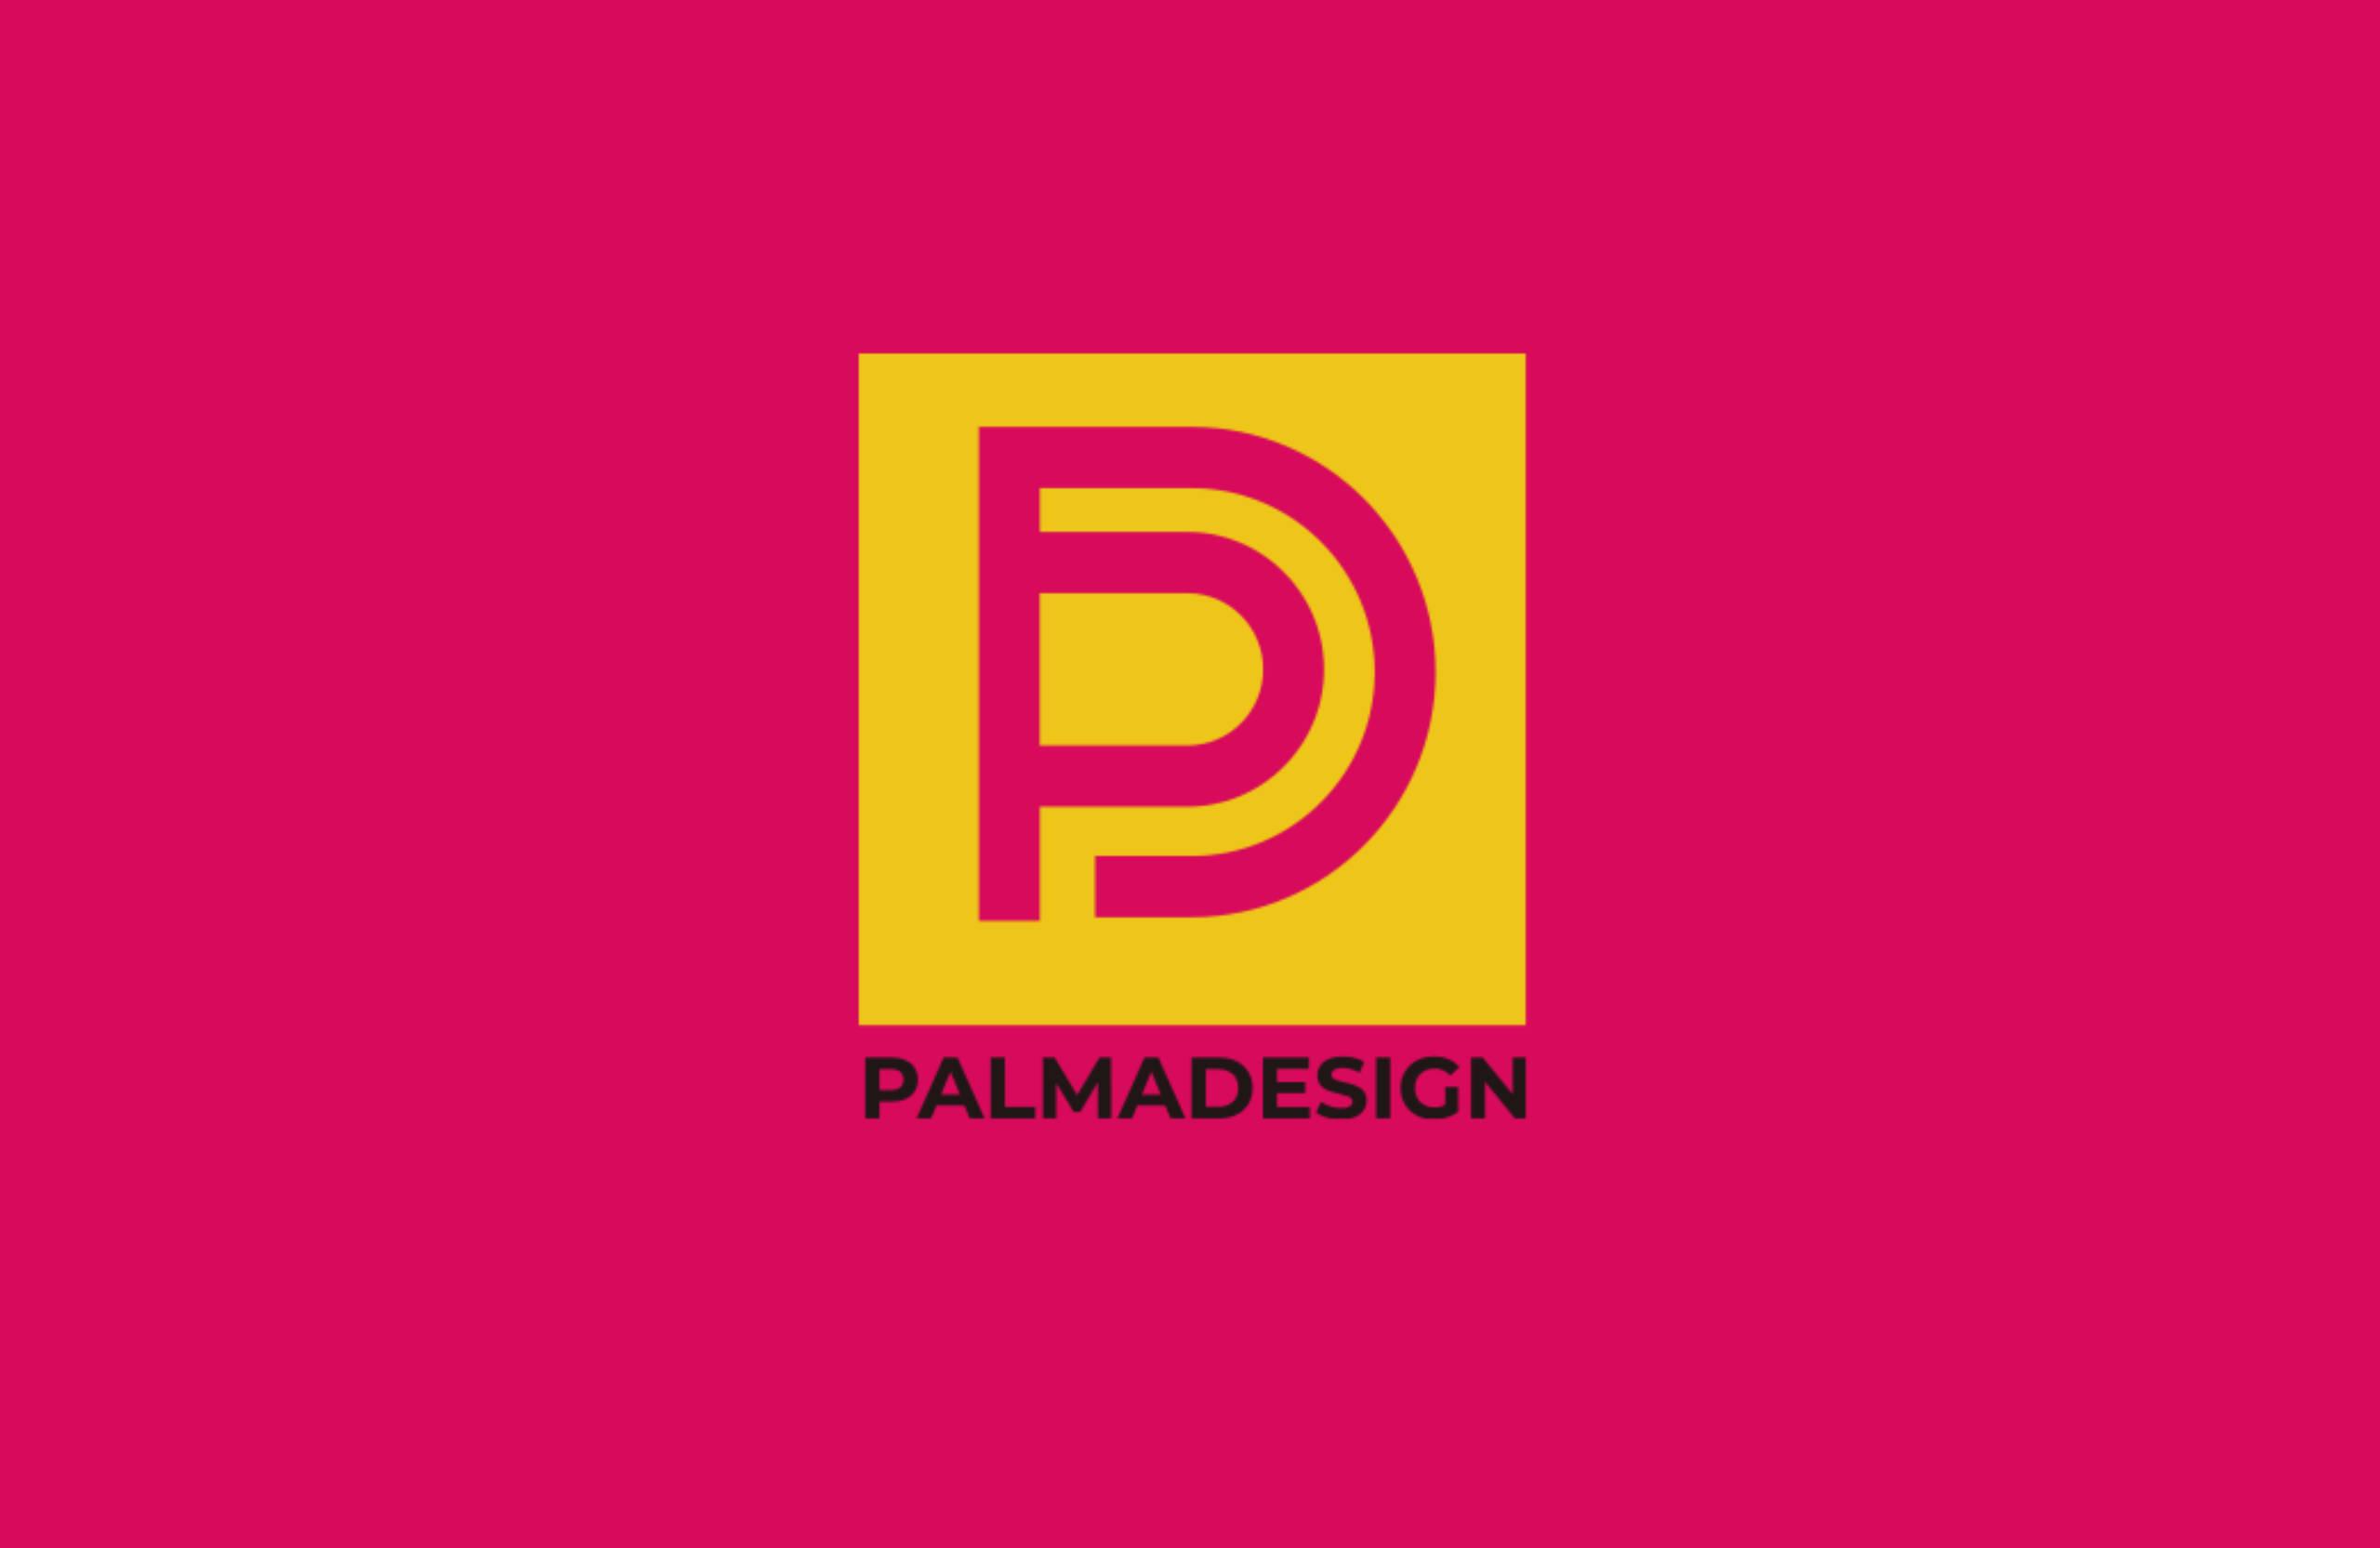 Palmadesign